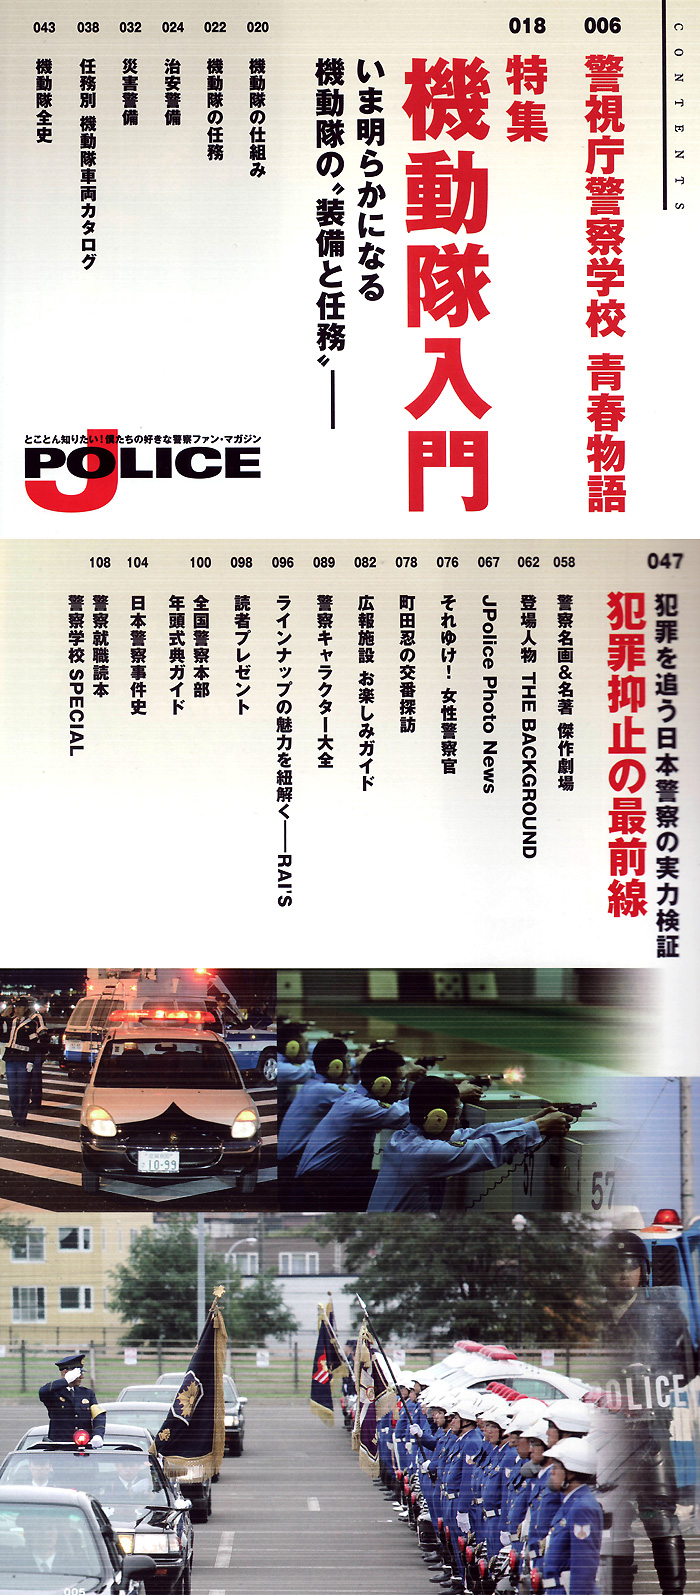 J POLICE Vol.7本(イカロス出版イカロスムックNo.61795-76)商品画像_1